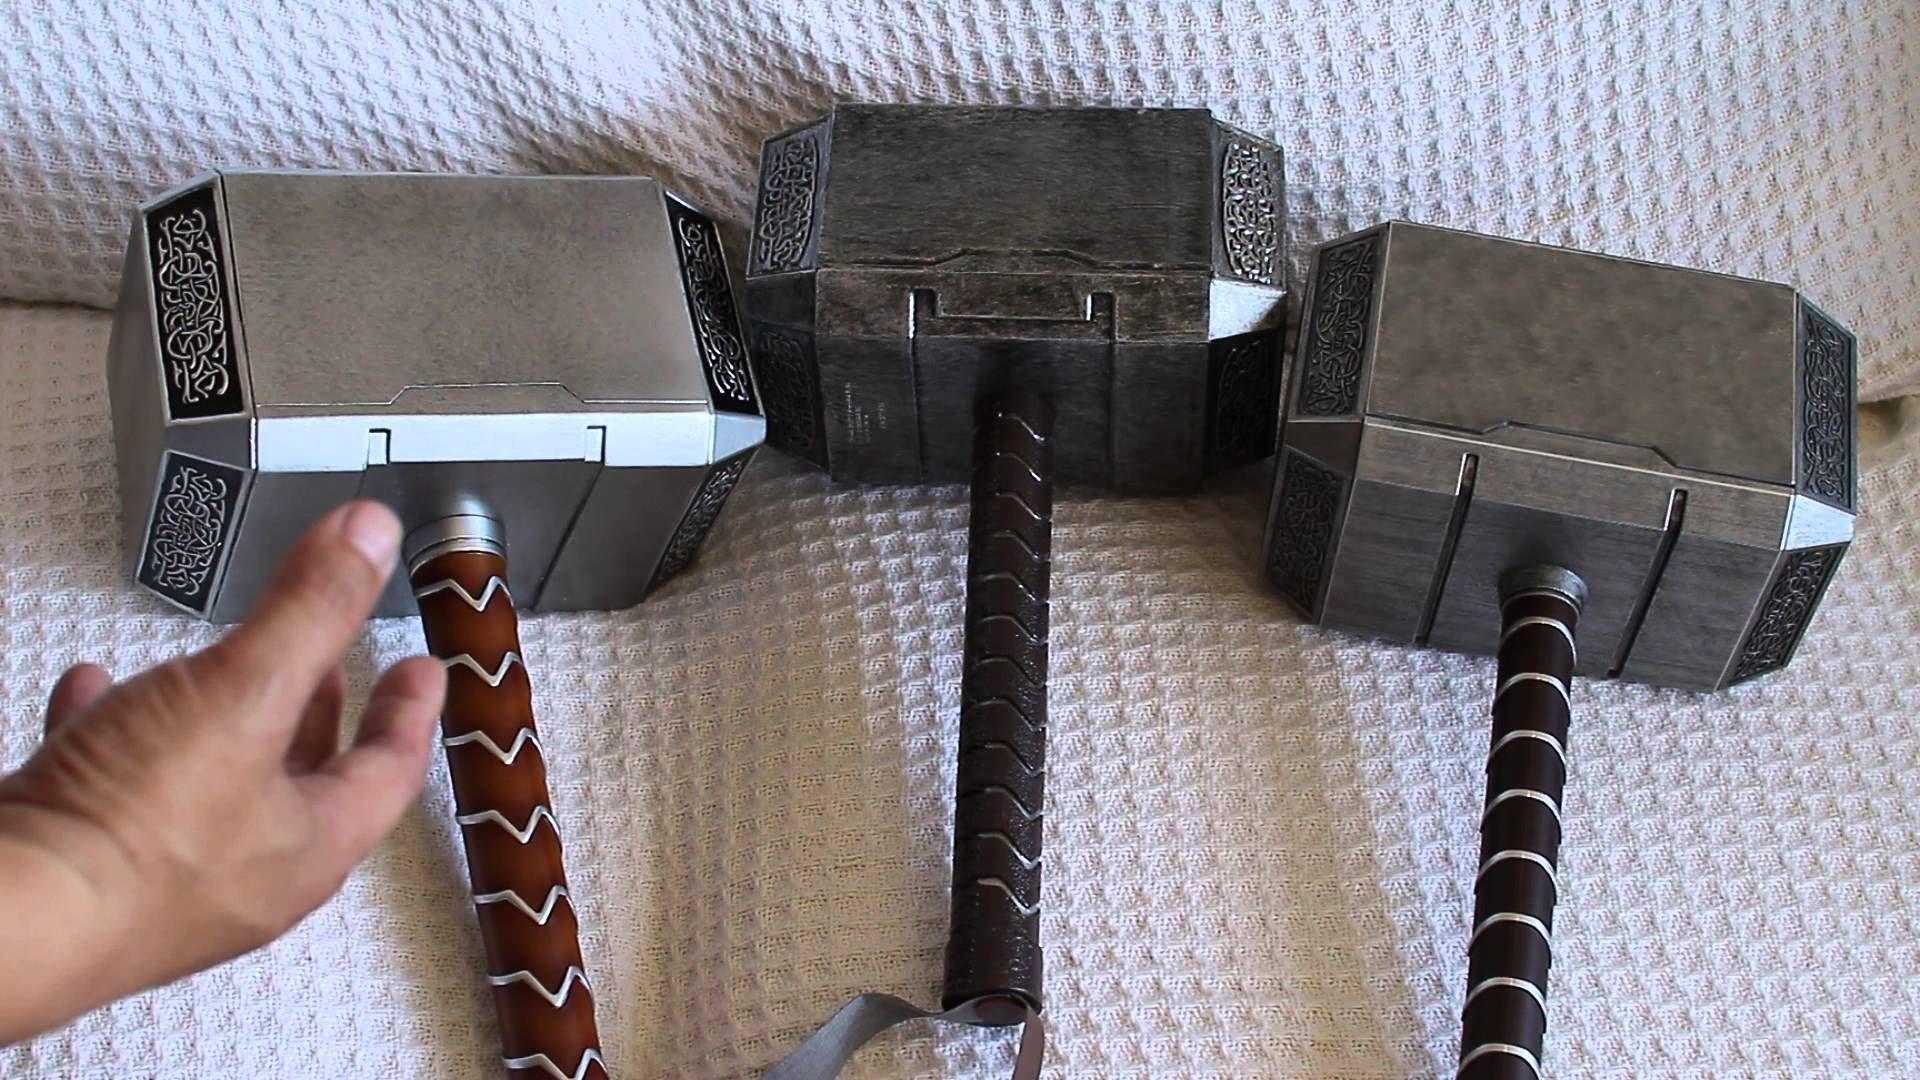 mjolnir comparison part 1 of 3 hammerheads thor hammer replica